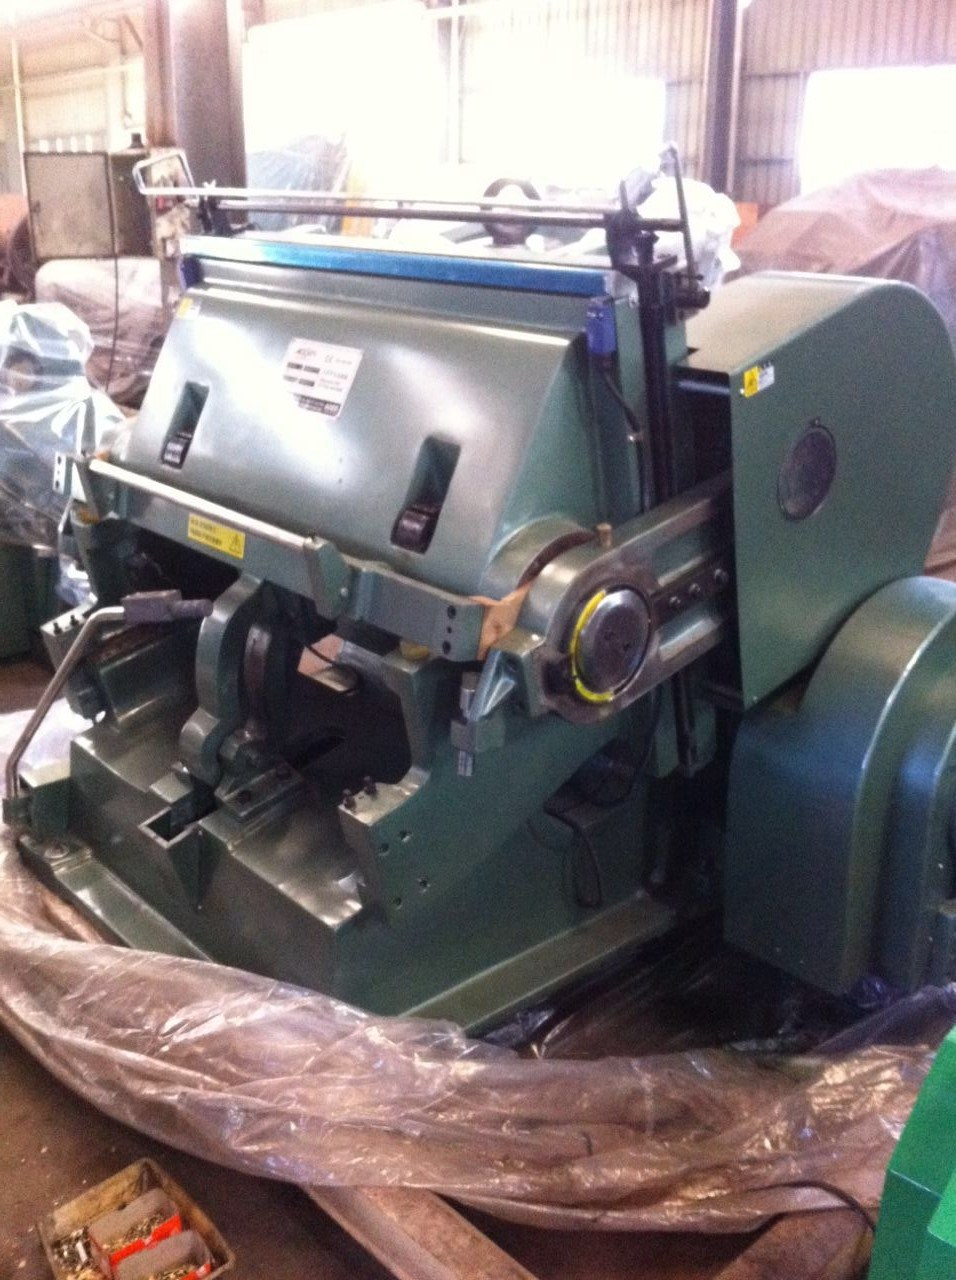 Ml-1100 Platen Press Type Creasing and Die Cutting Machine